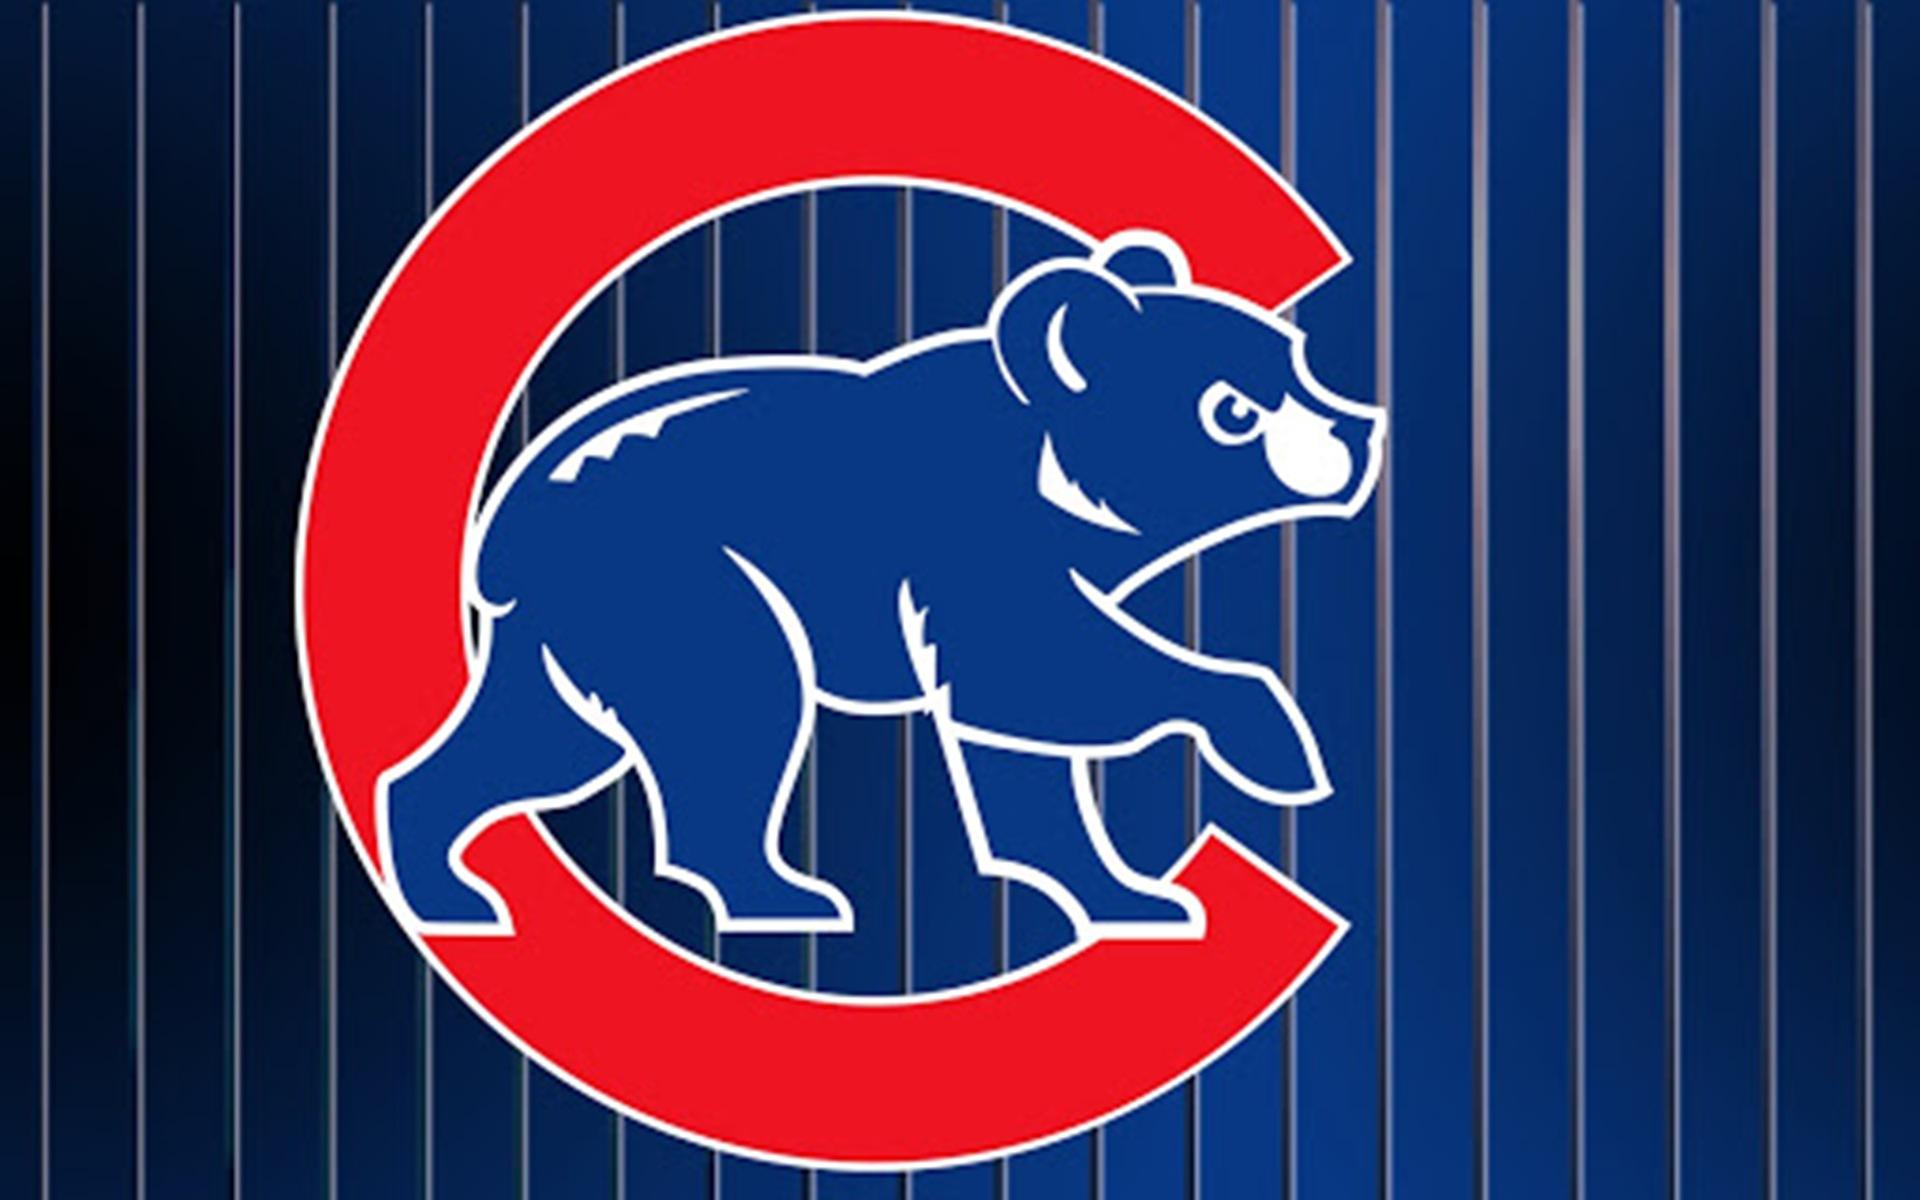 Chicago Cubs Wallpaper 6889852 1920x1200